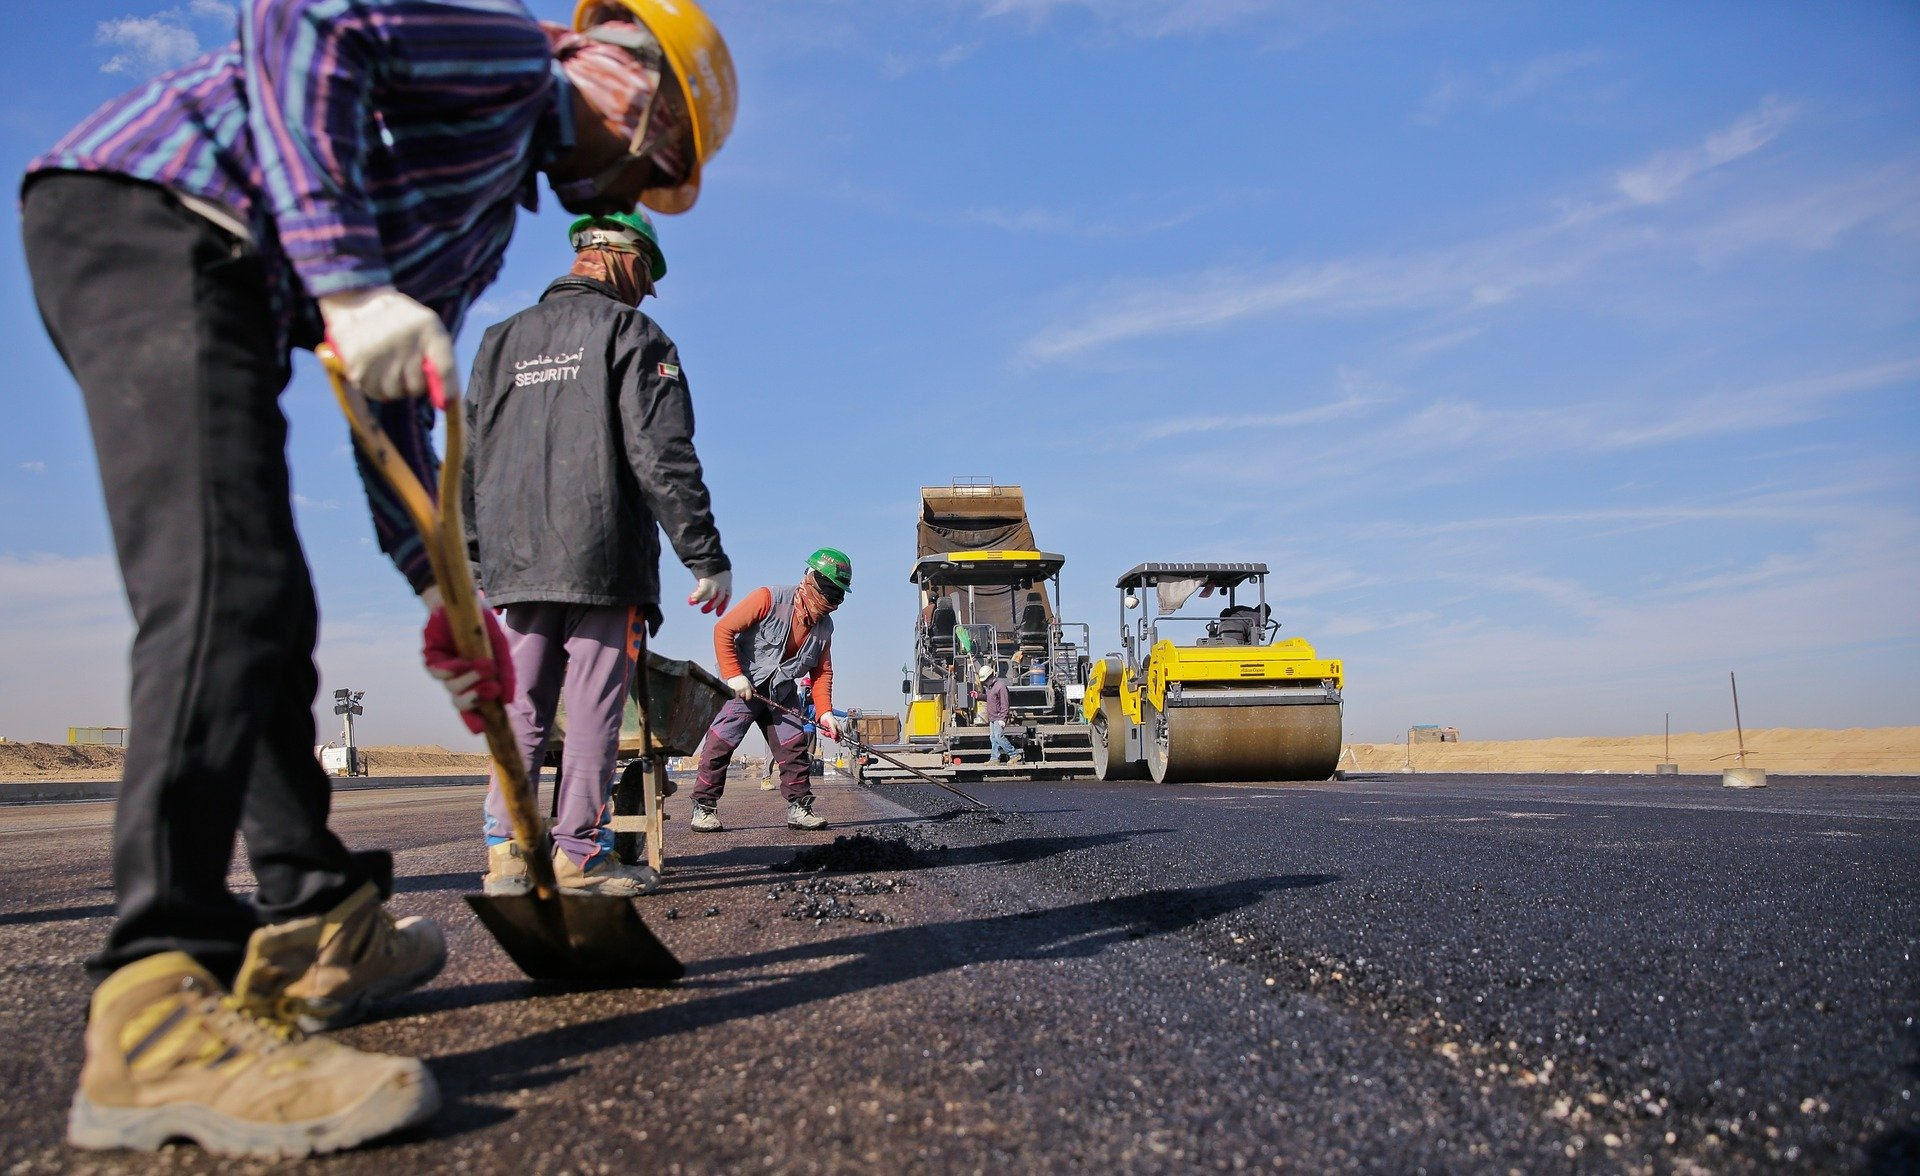 Clases de mezcla y espesores de capas de asfalto (II)